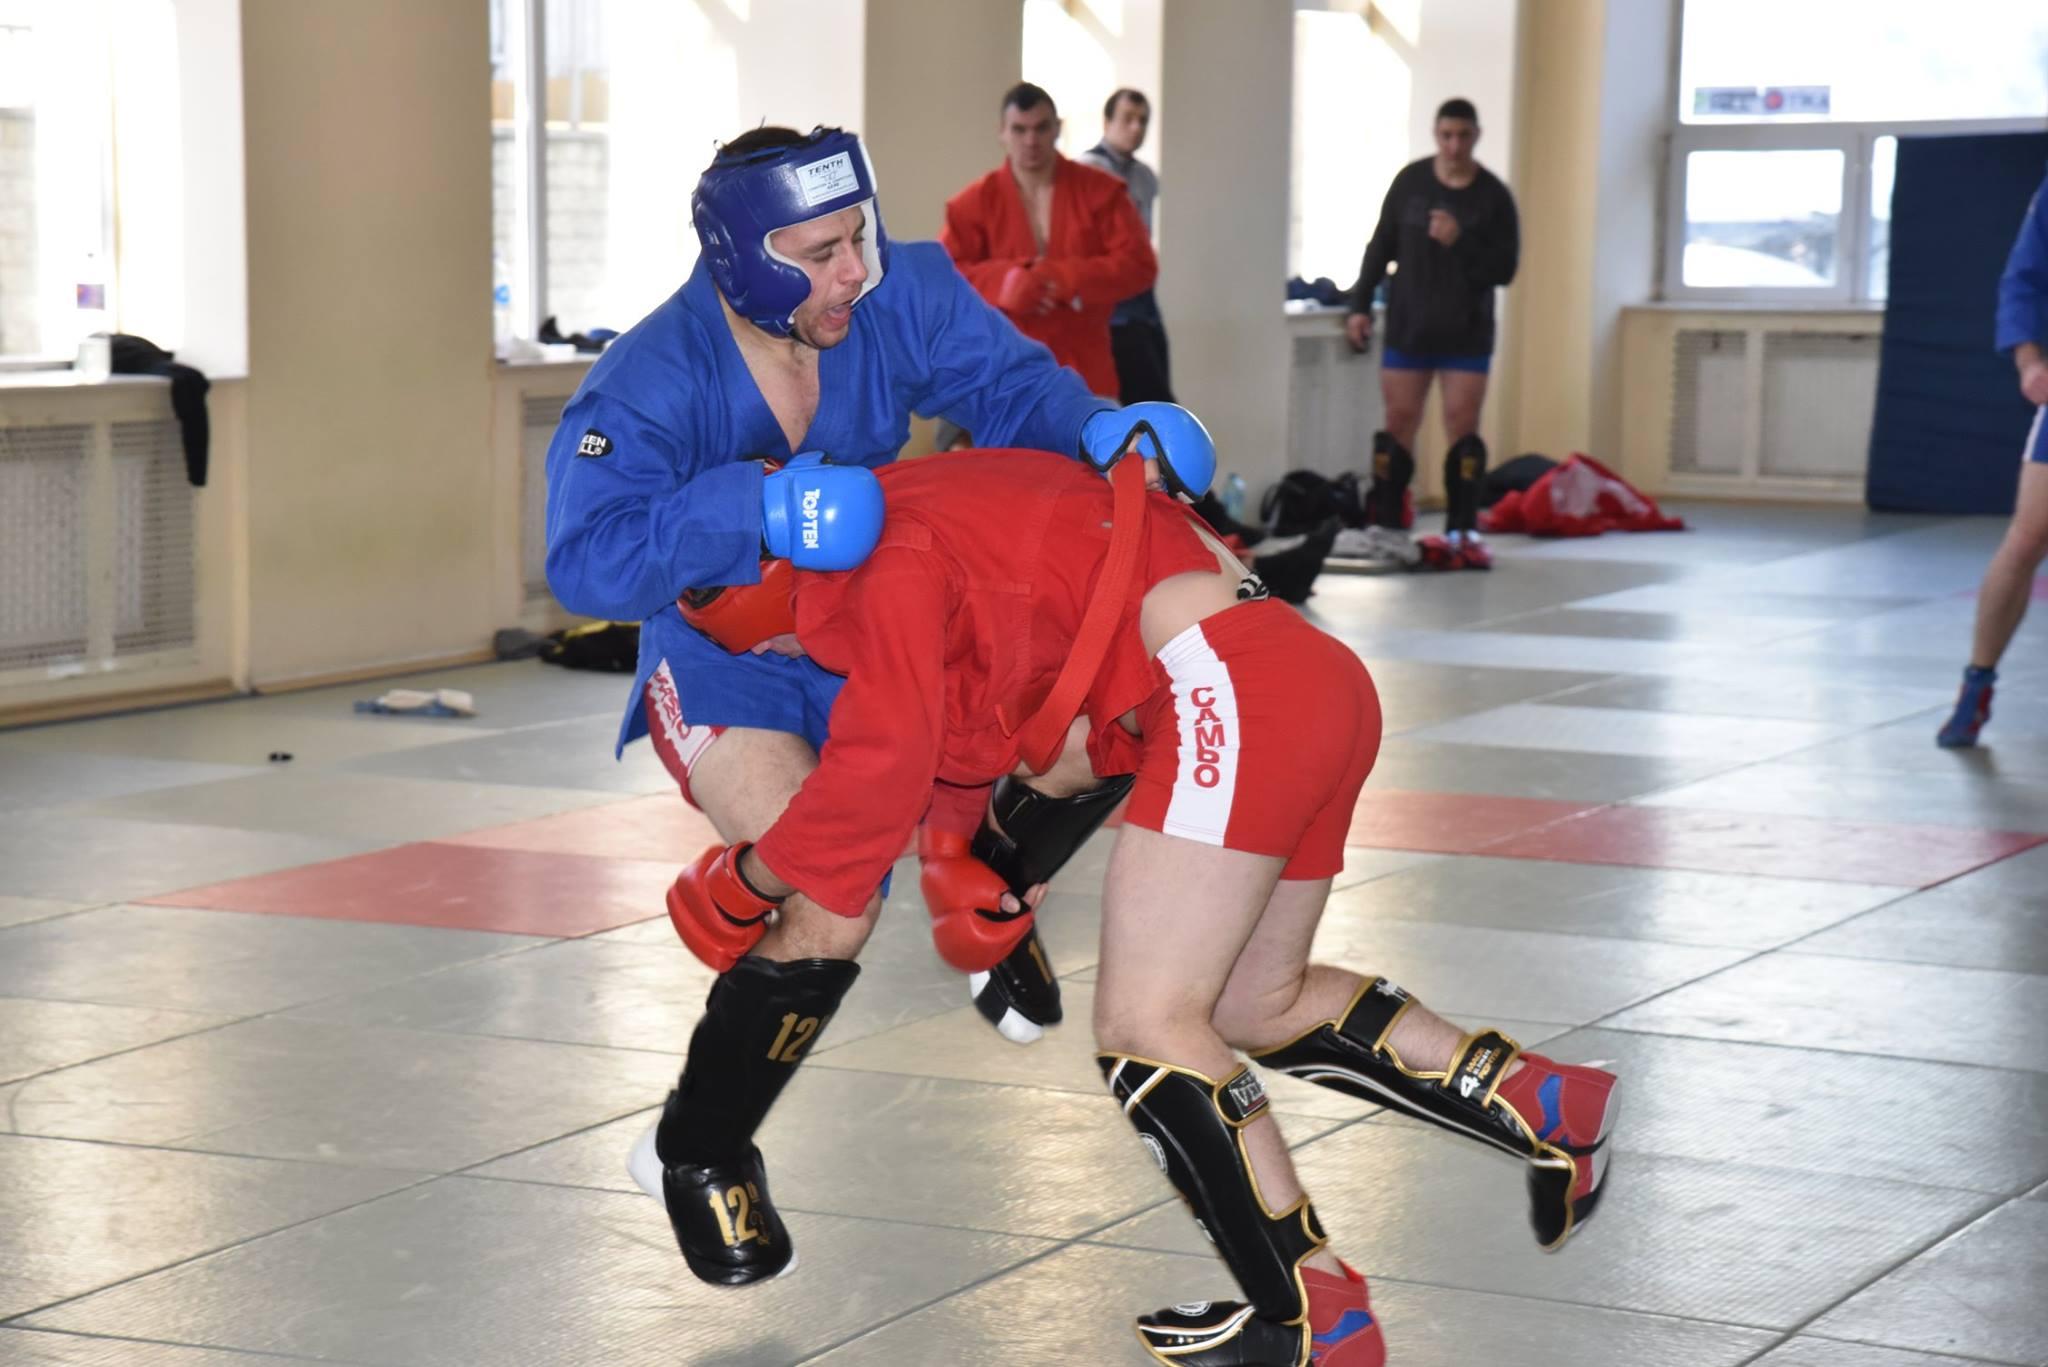 Lupta corp la corp din cadrul Spartachiadei CSC Dinamo 201839